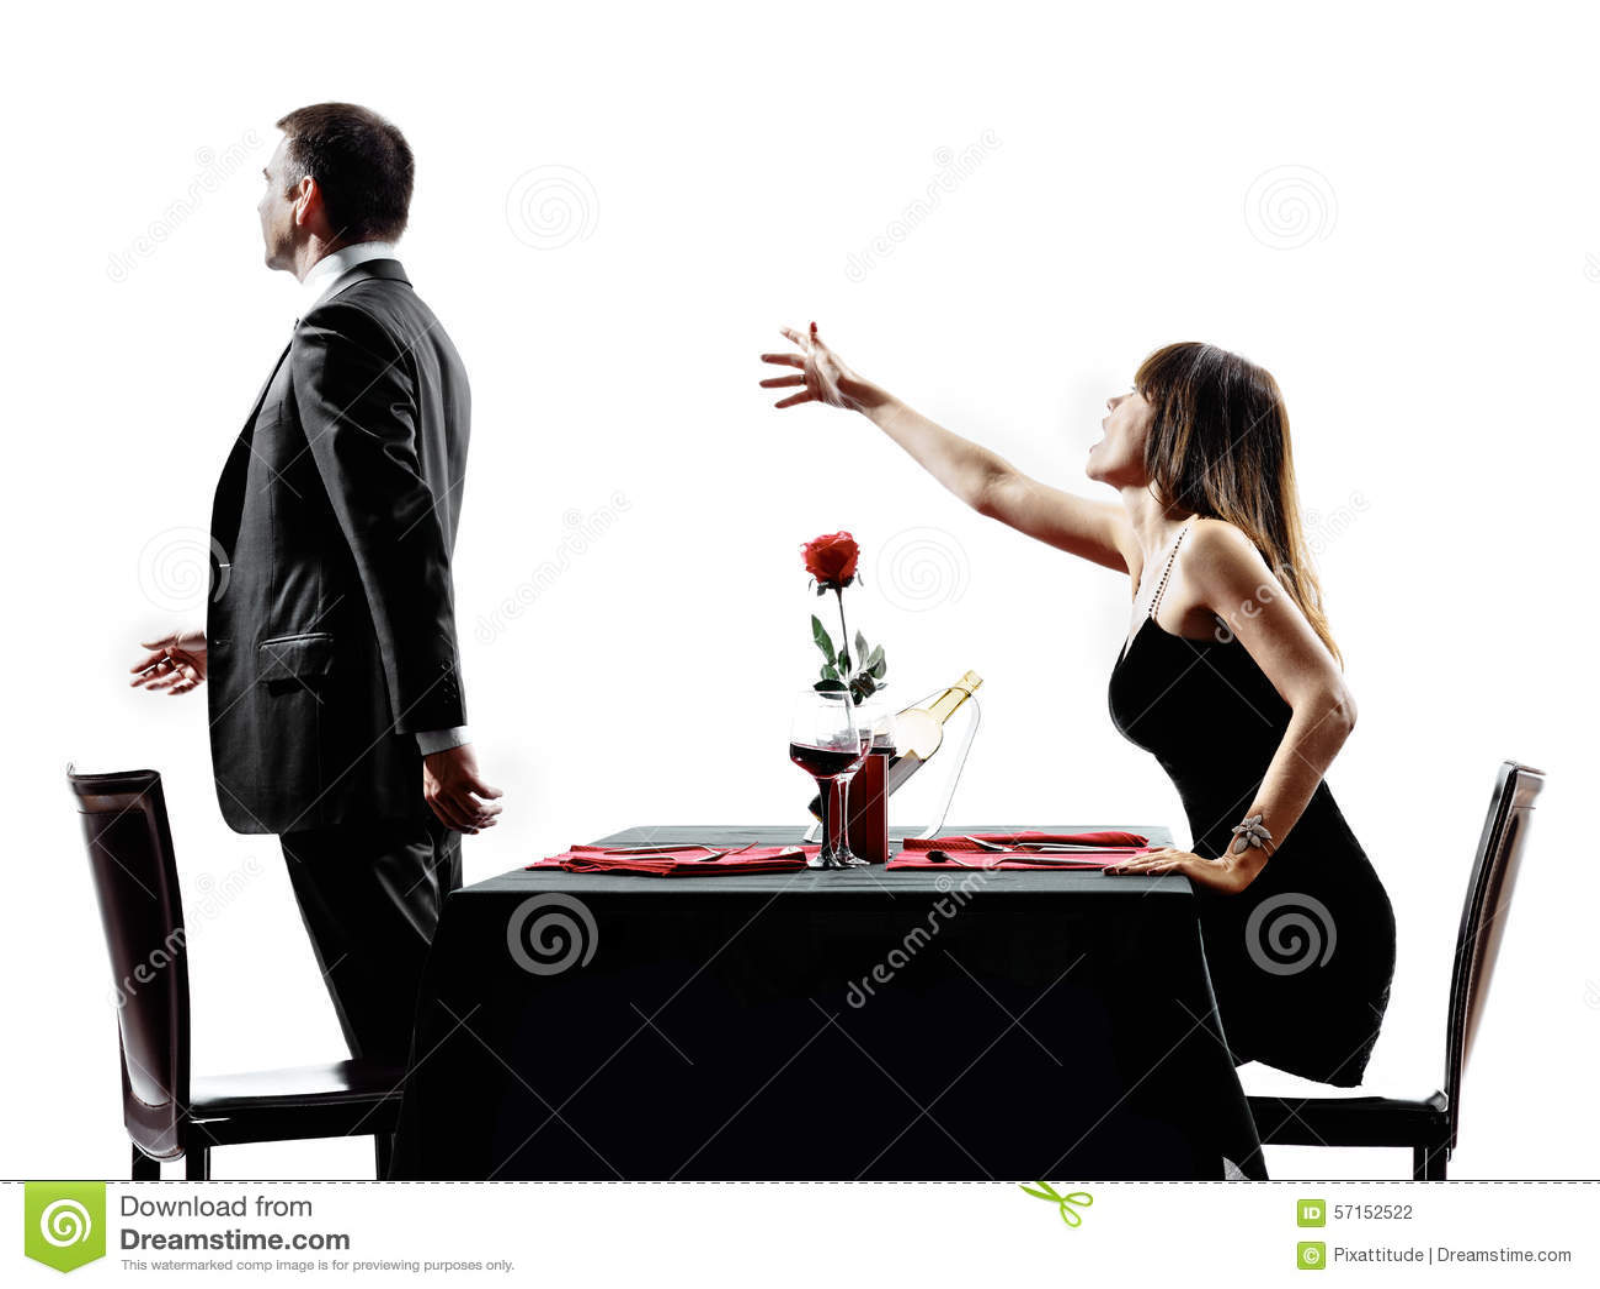 british vs american dating culture